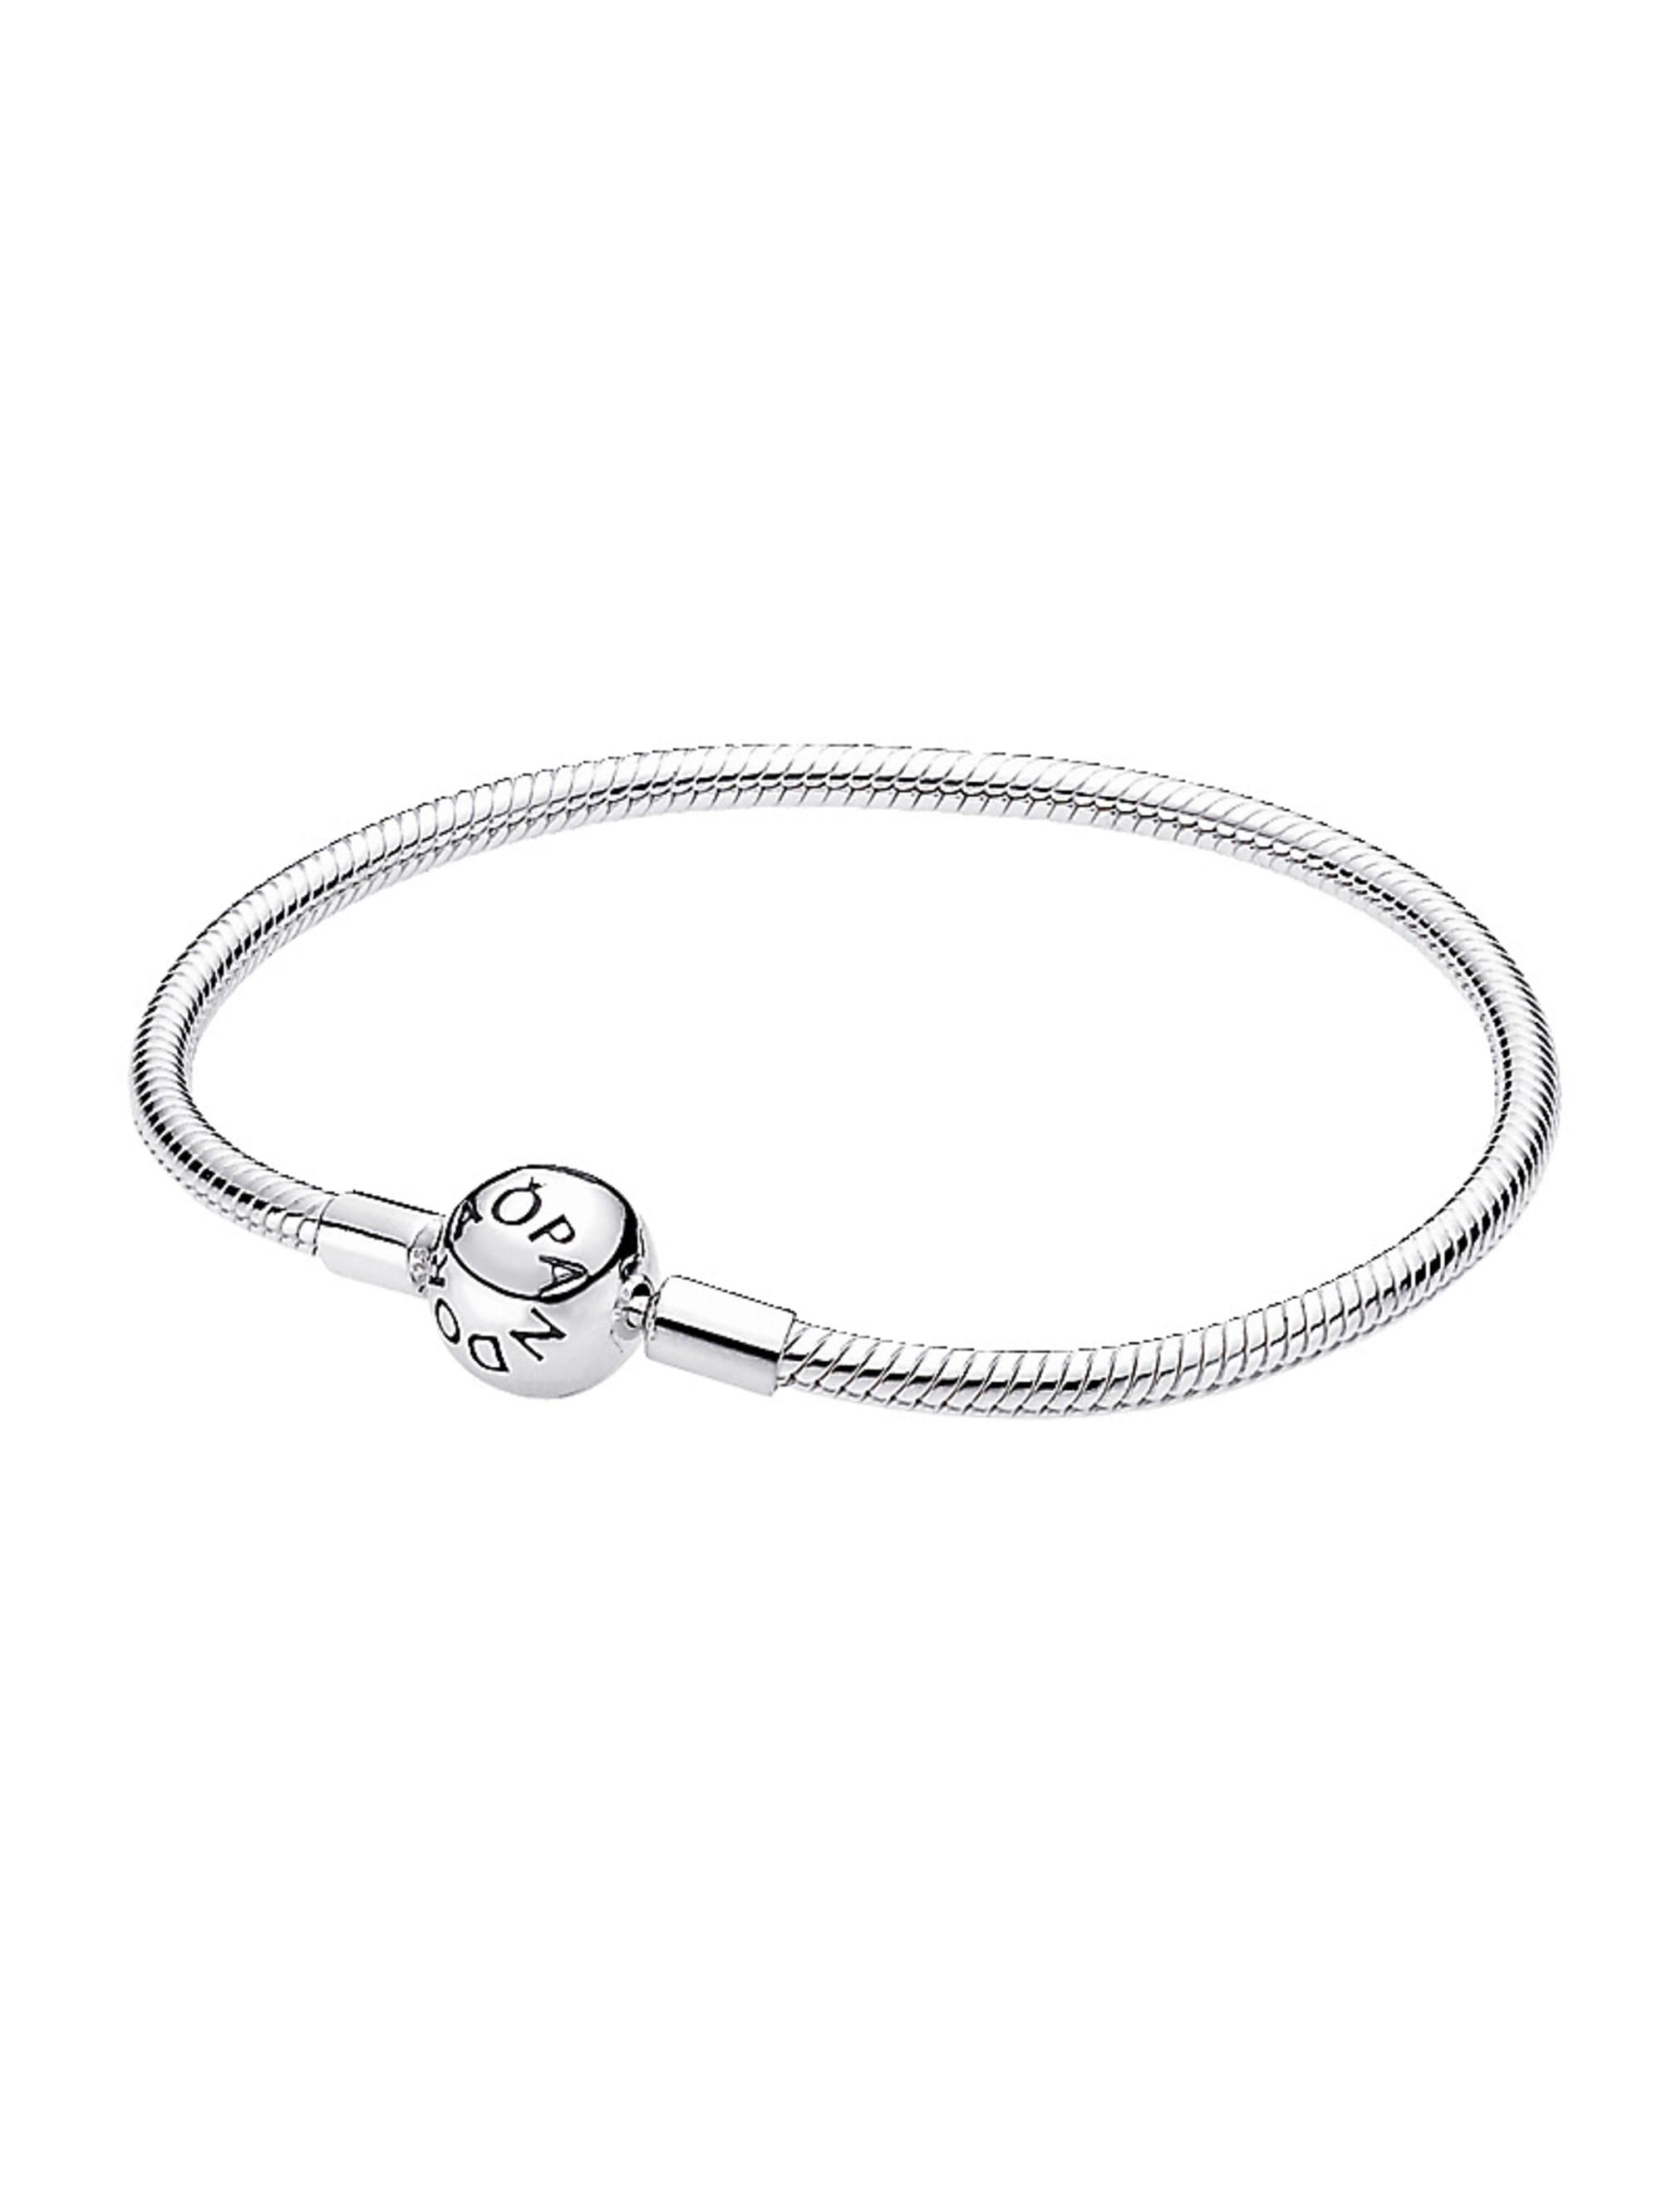 Pandora Armband mit Logo 590728-20 Kw4A7